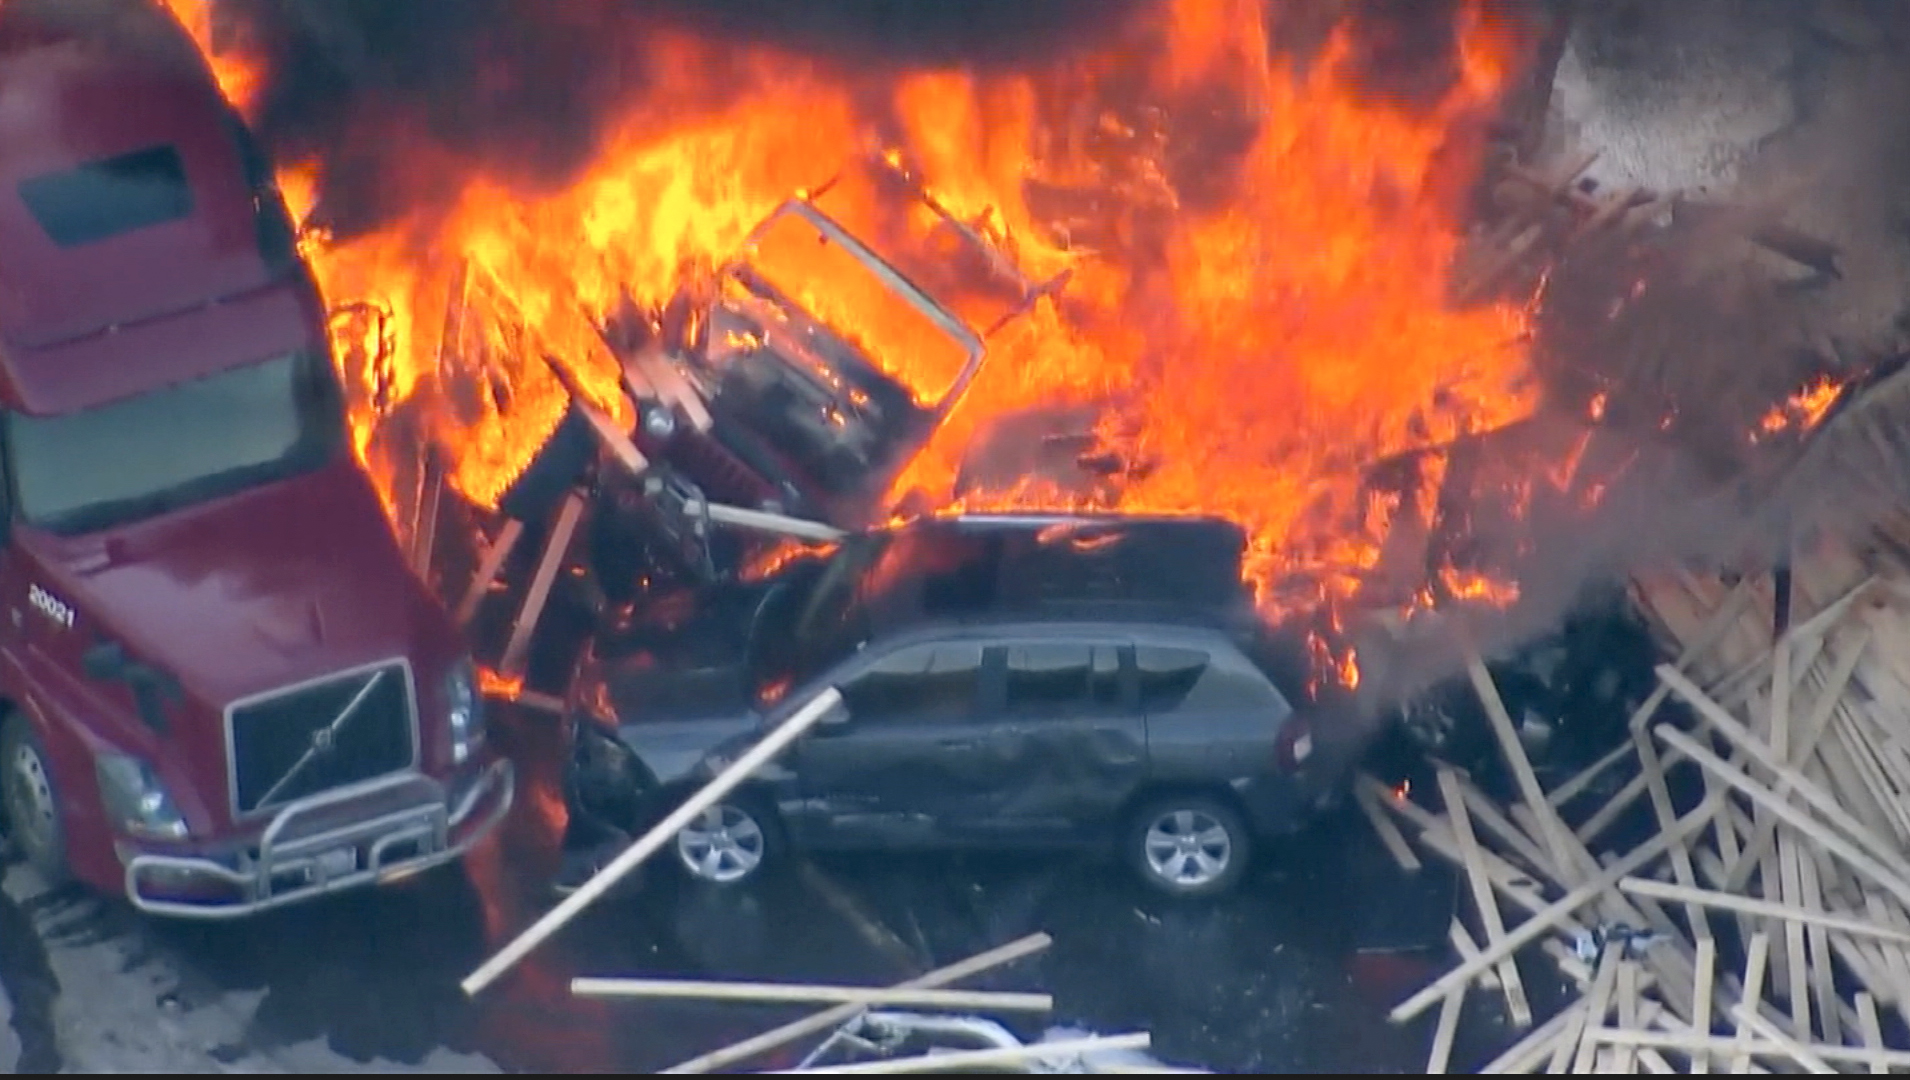 Semi plows into snarled traffic, ignites massive fire